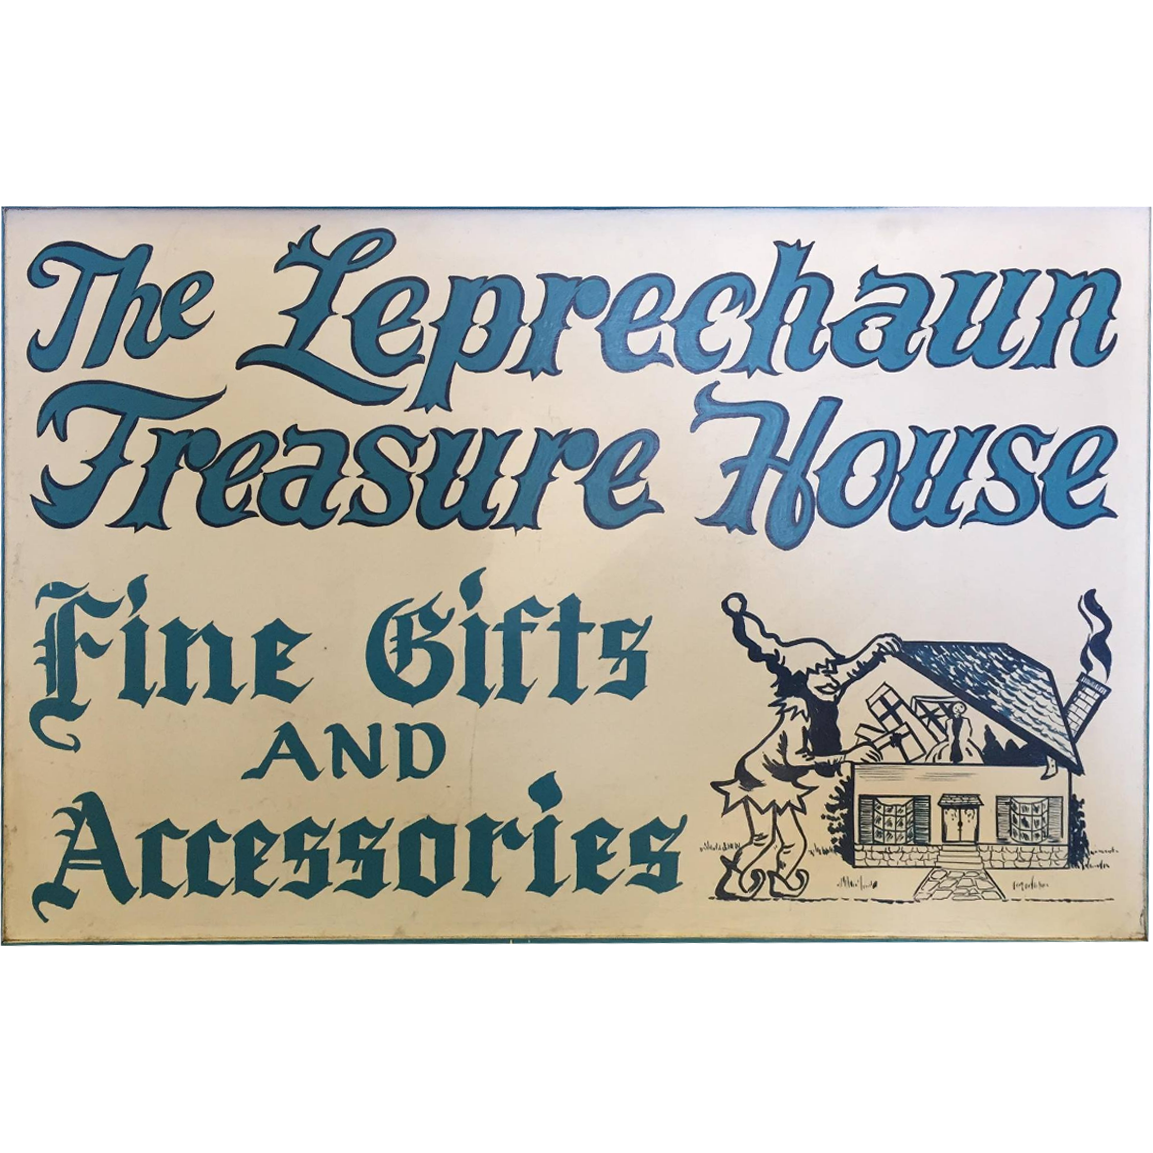 The Leprechaun Treasure House